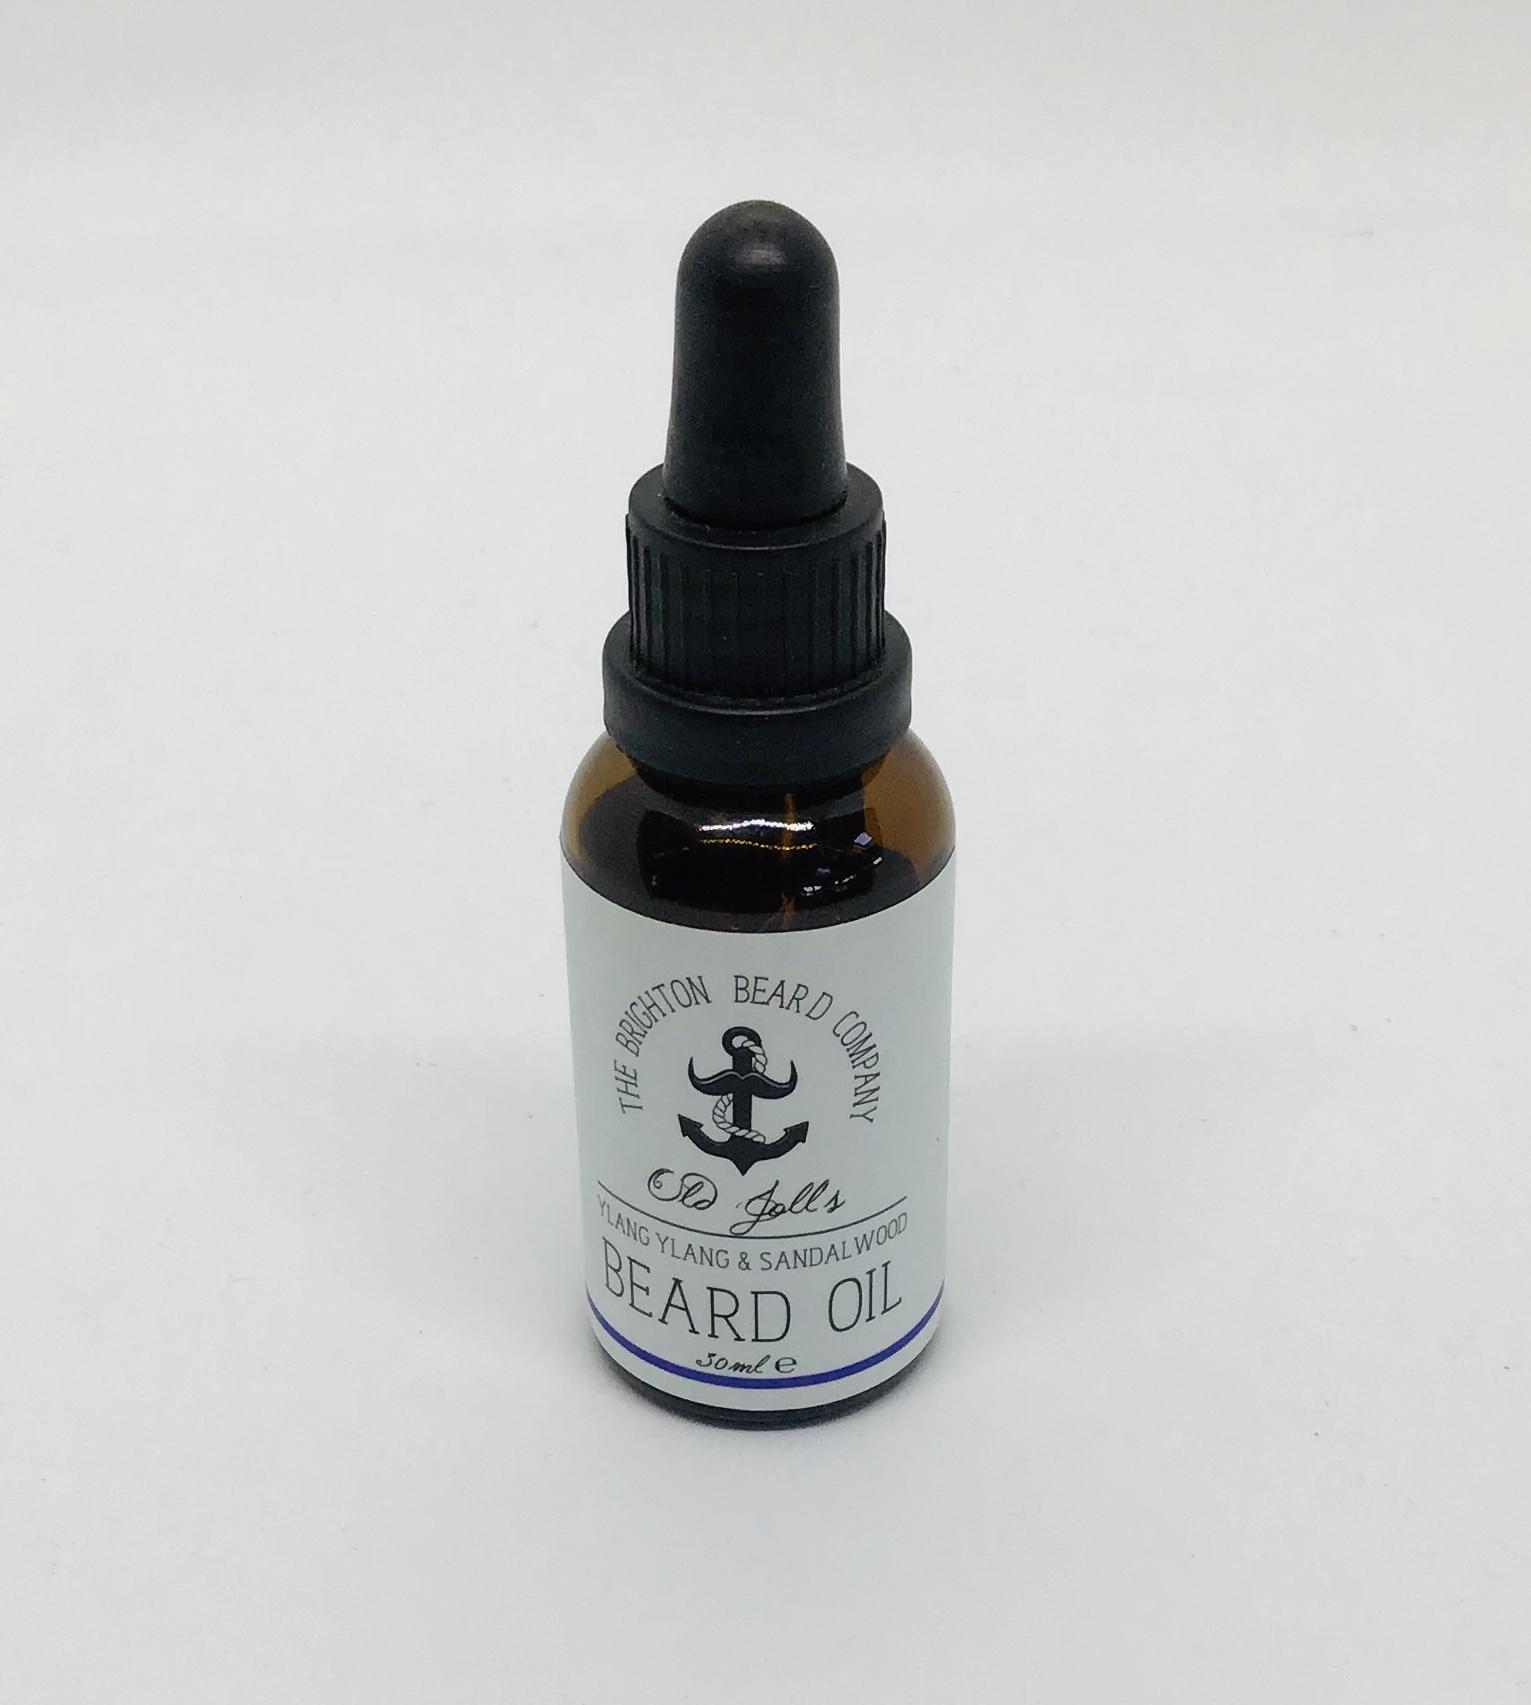 Brighton Beard Oil large